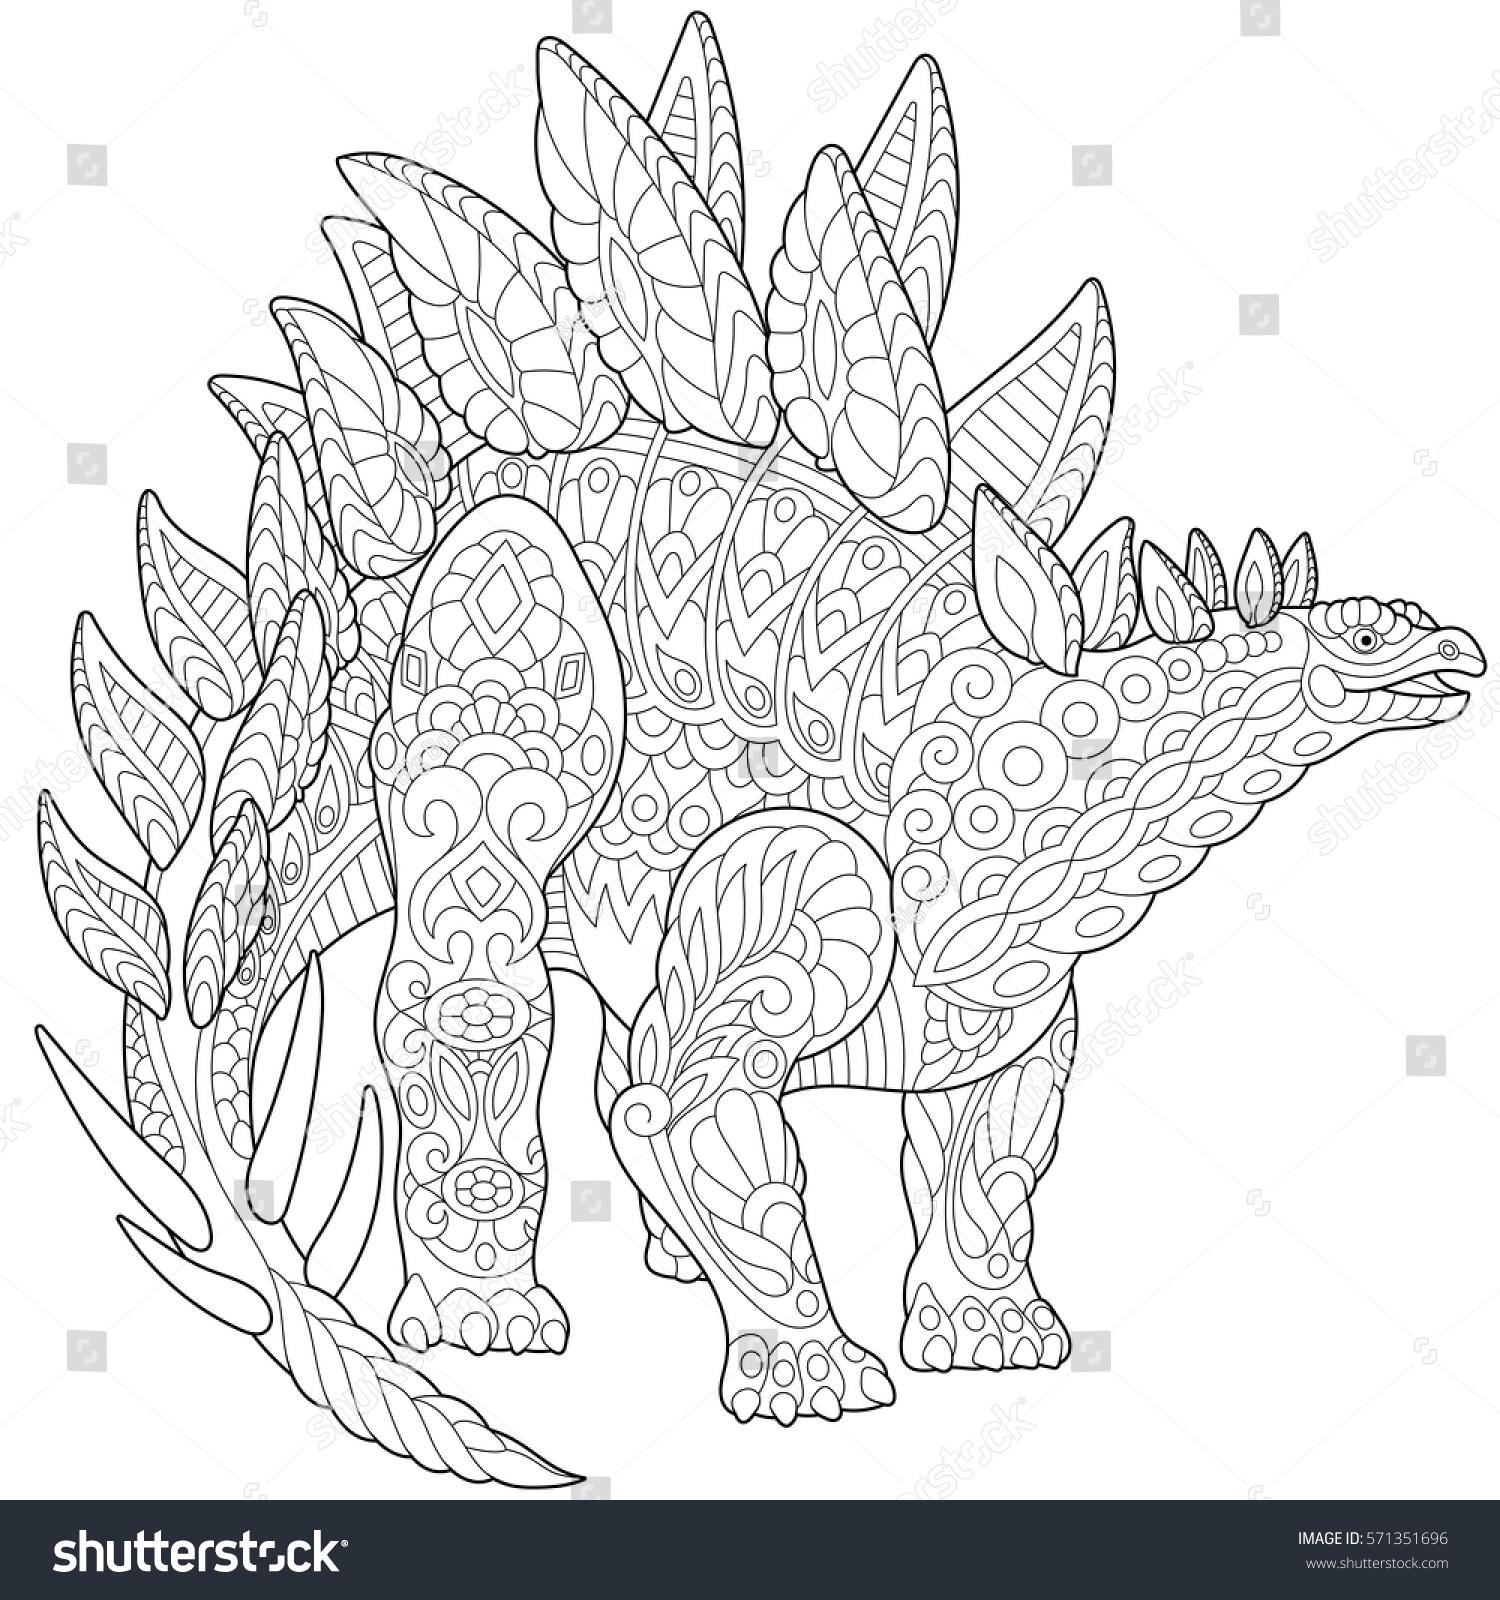 Stylized Stegosaurus Dinosaur Jurassic Early Cretaceous Stock Vector